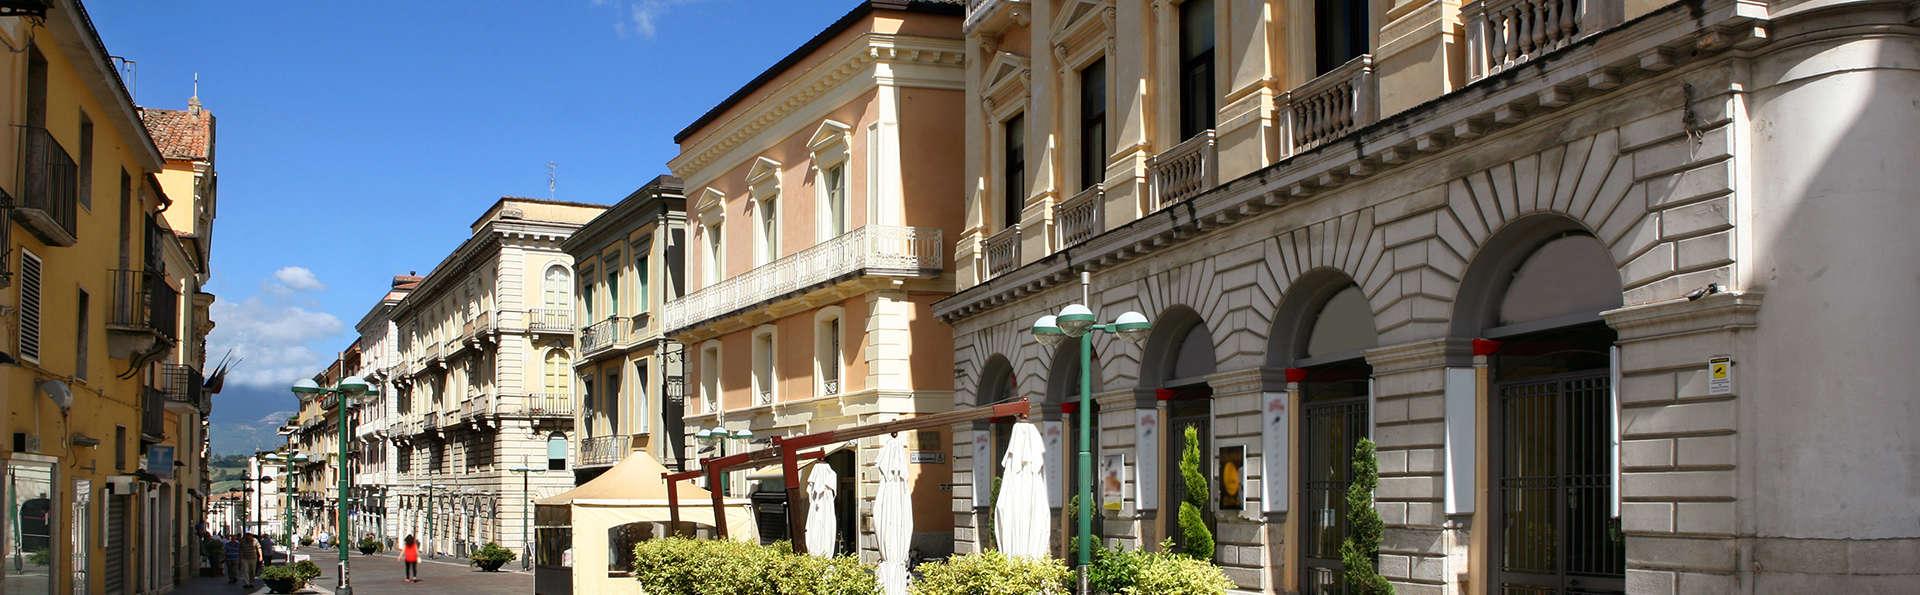 Hotel Villa Traiano - Edit_Benevento.jpg